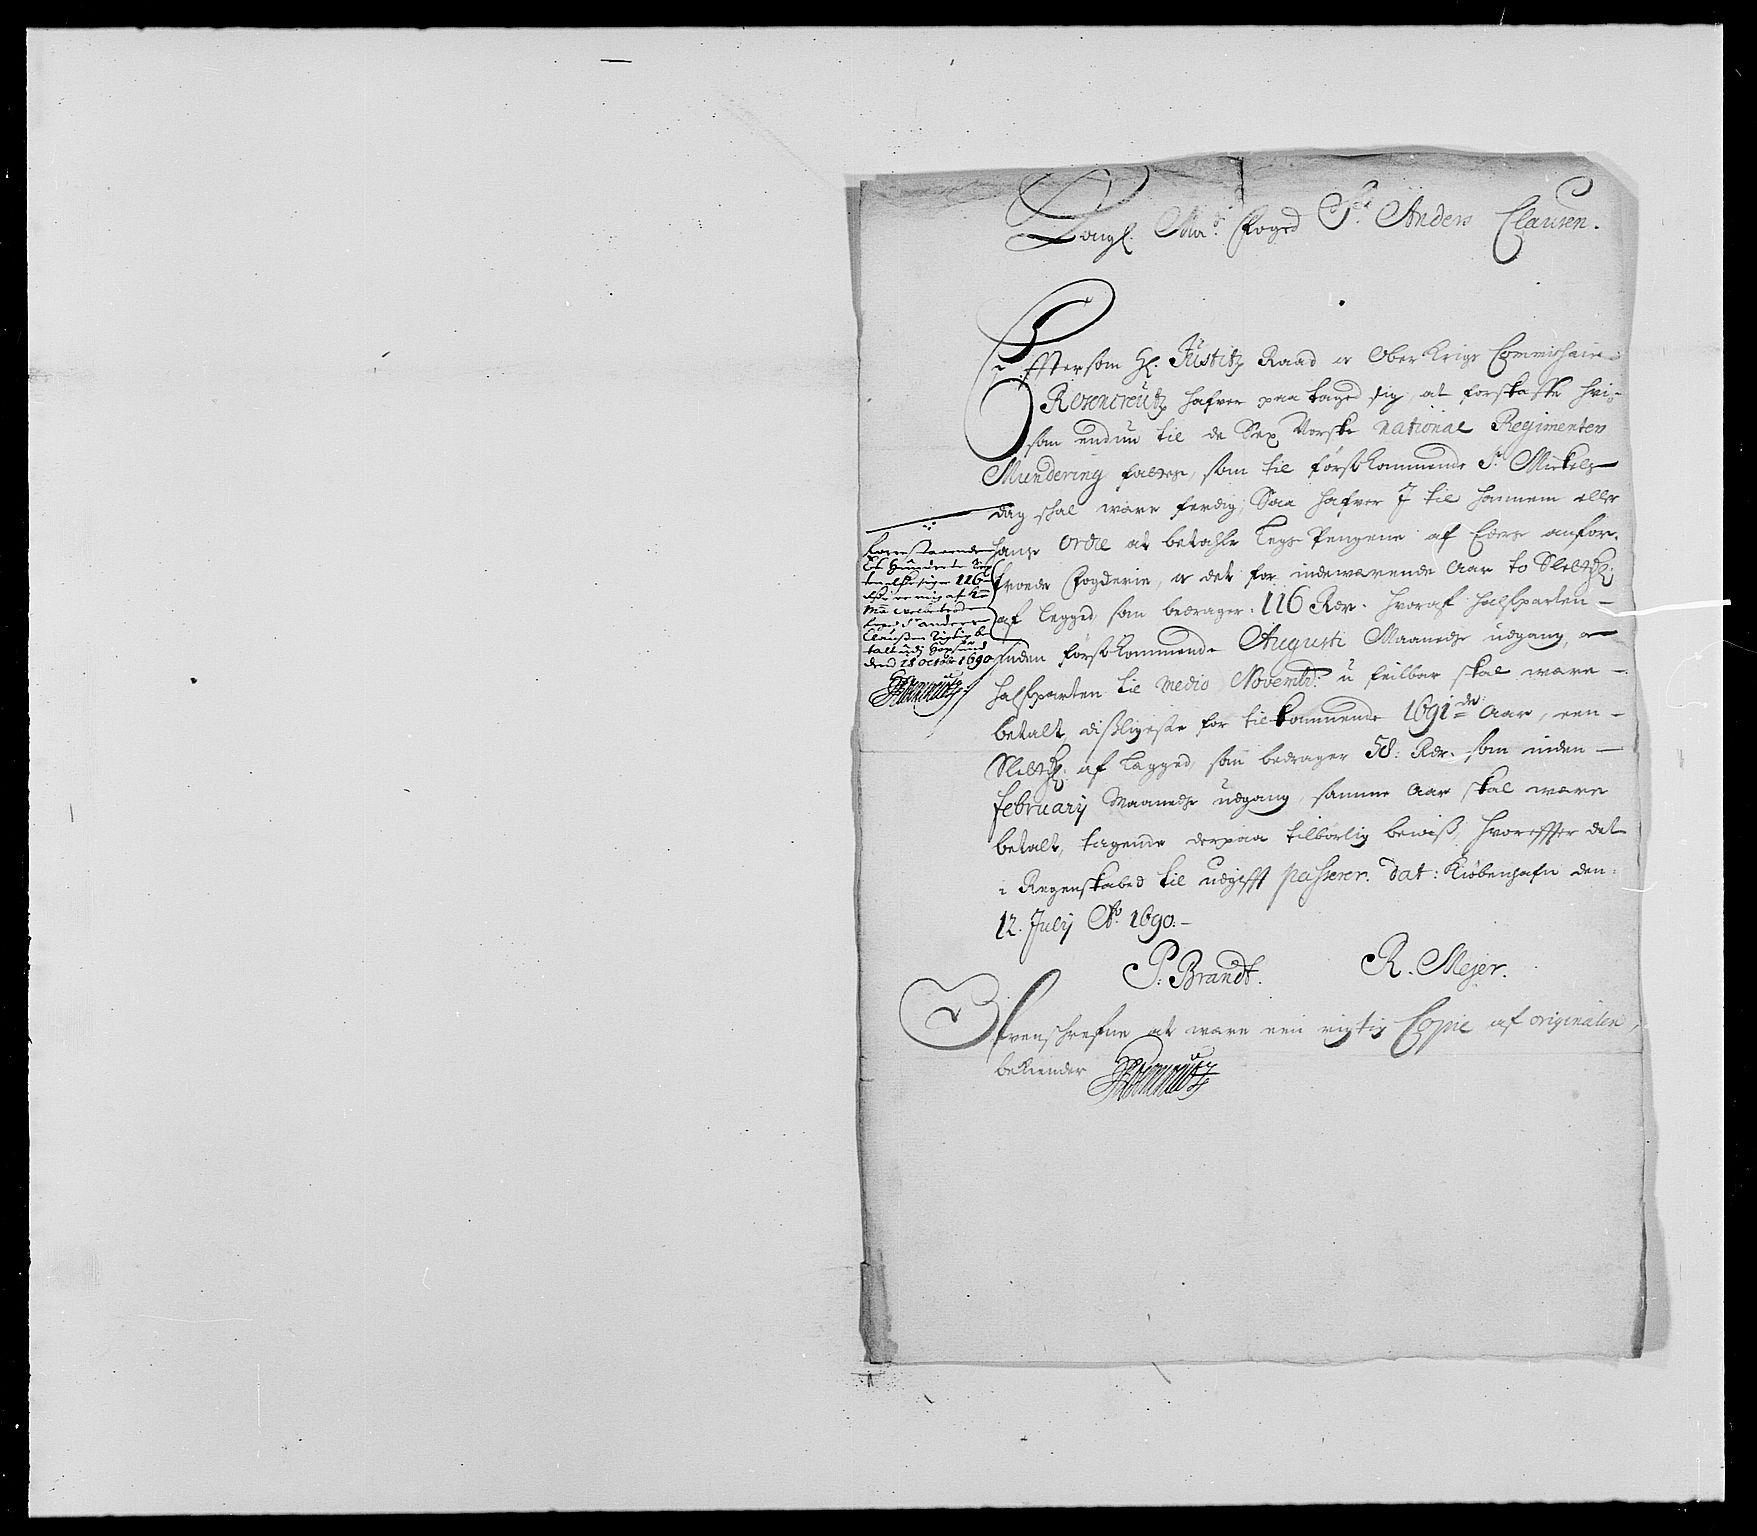 RA, Rentekammeret inntil 1814, Reviderte regnskaper, Fogderegnskap, R25/L1680: Fogderegnskap Buskerud, 1689-1690, s. 456